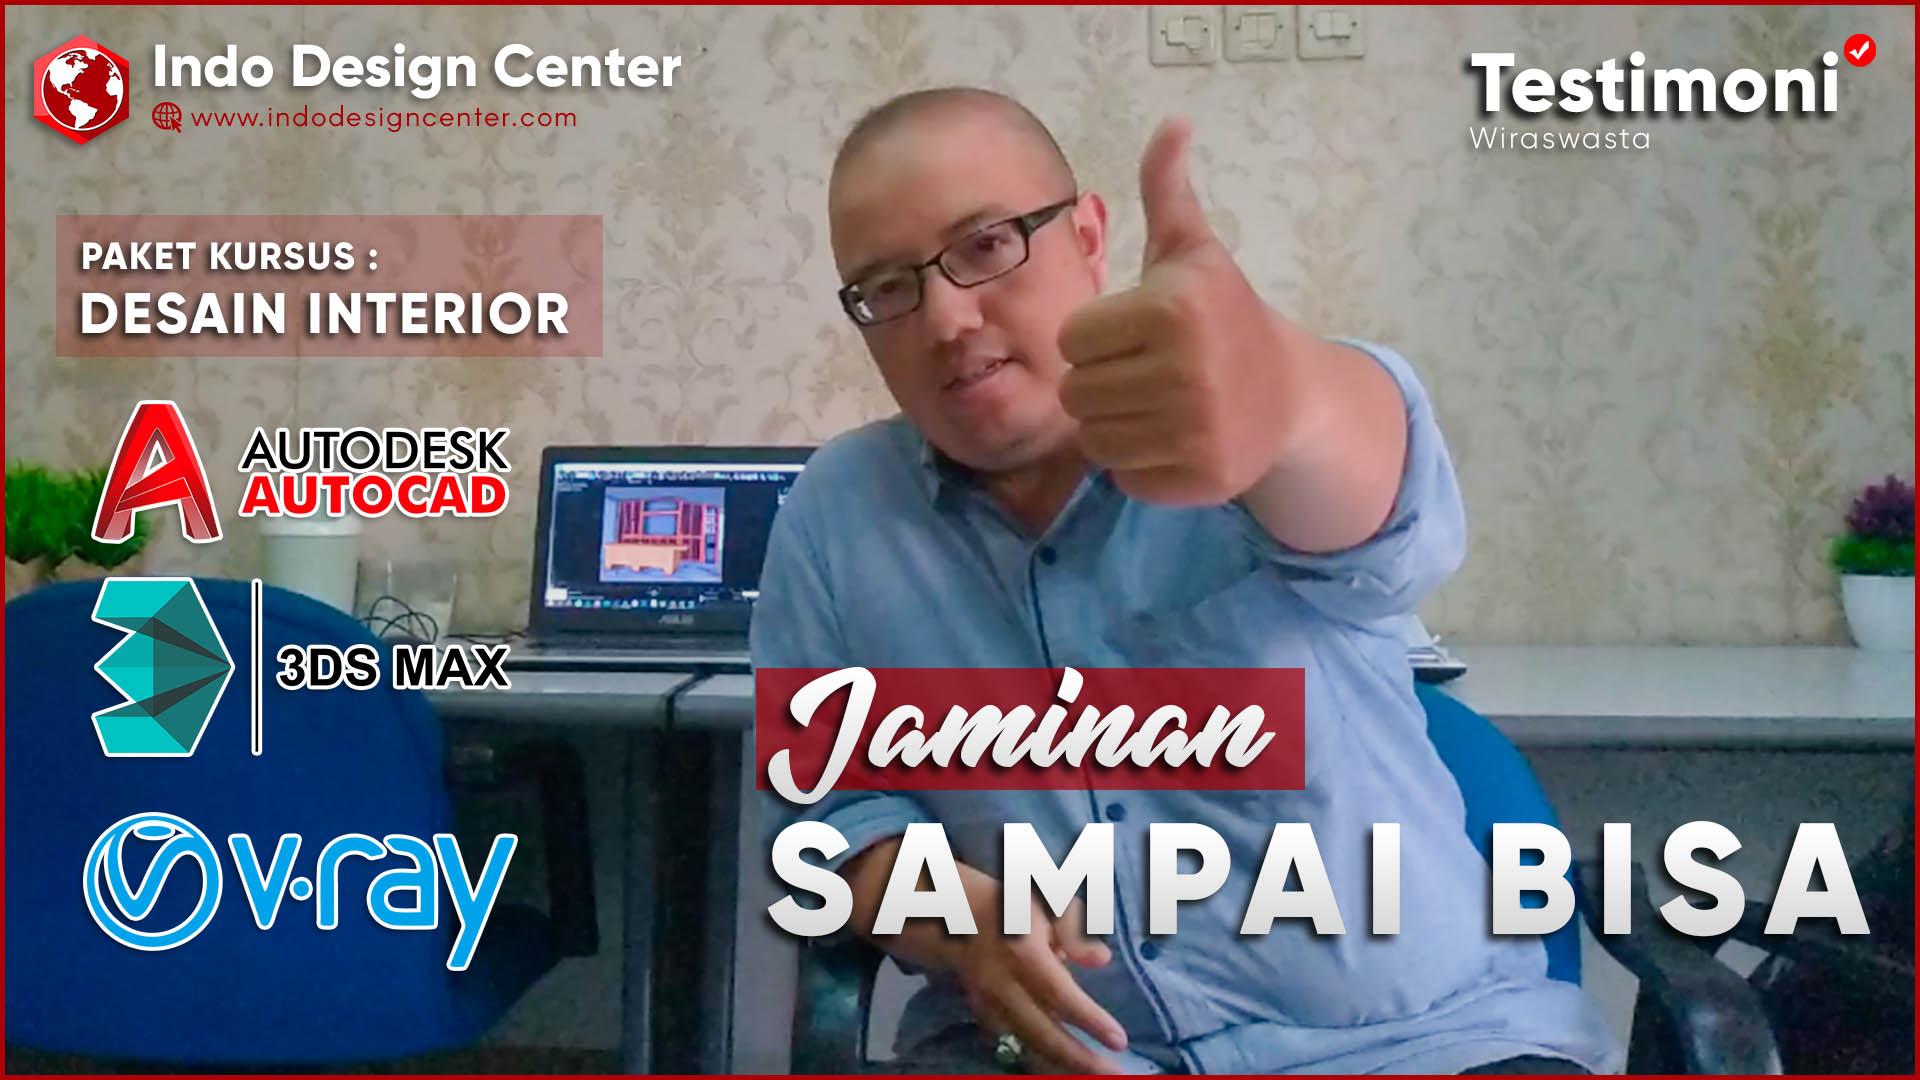 Danu-Desain Interior-Indo Design Center-Kursus Autocad Terbaik Jaminan Sampai Bisa